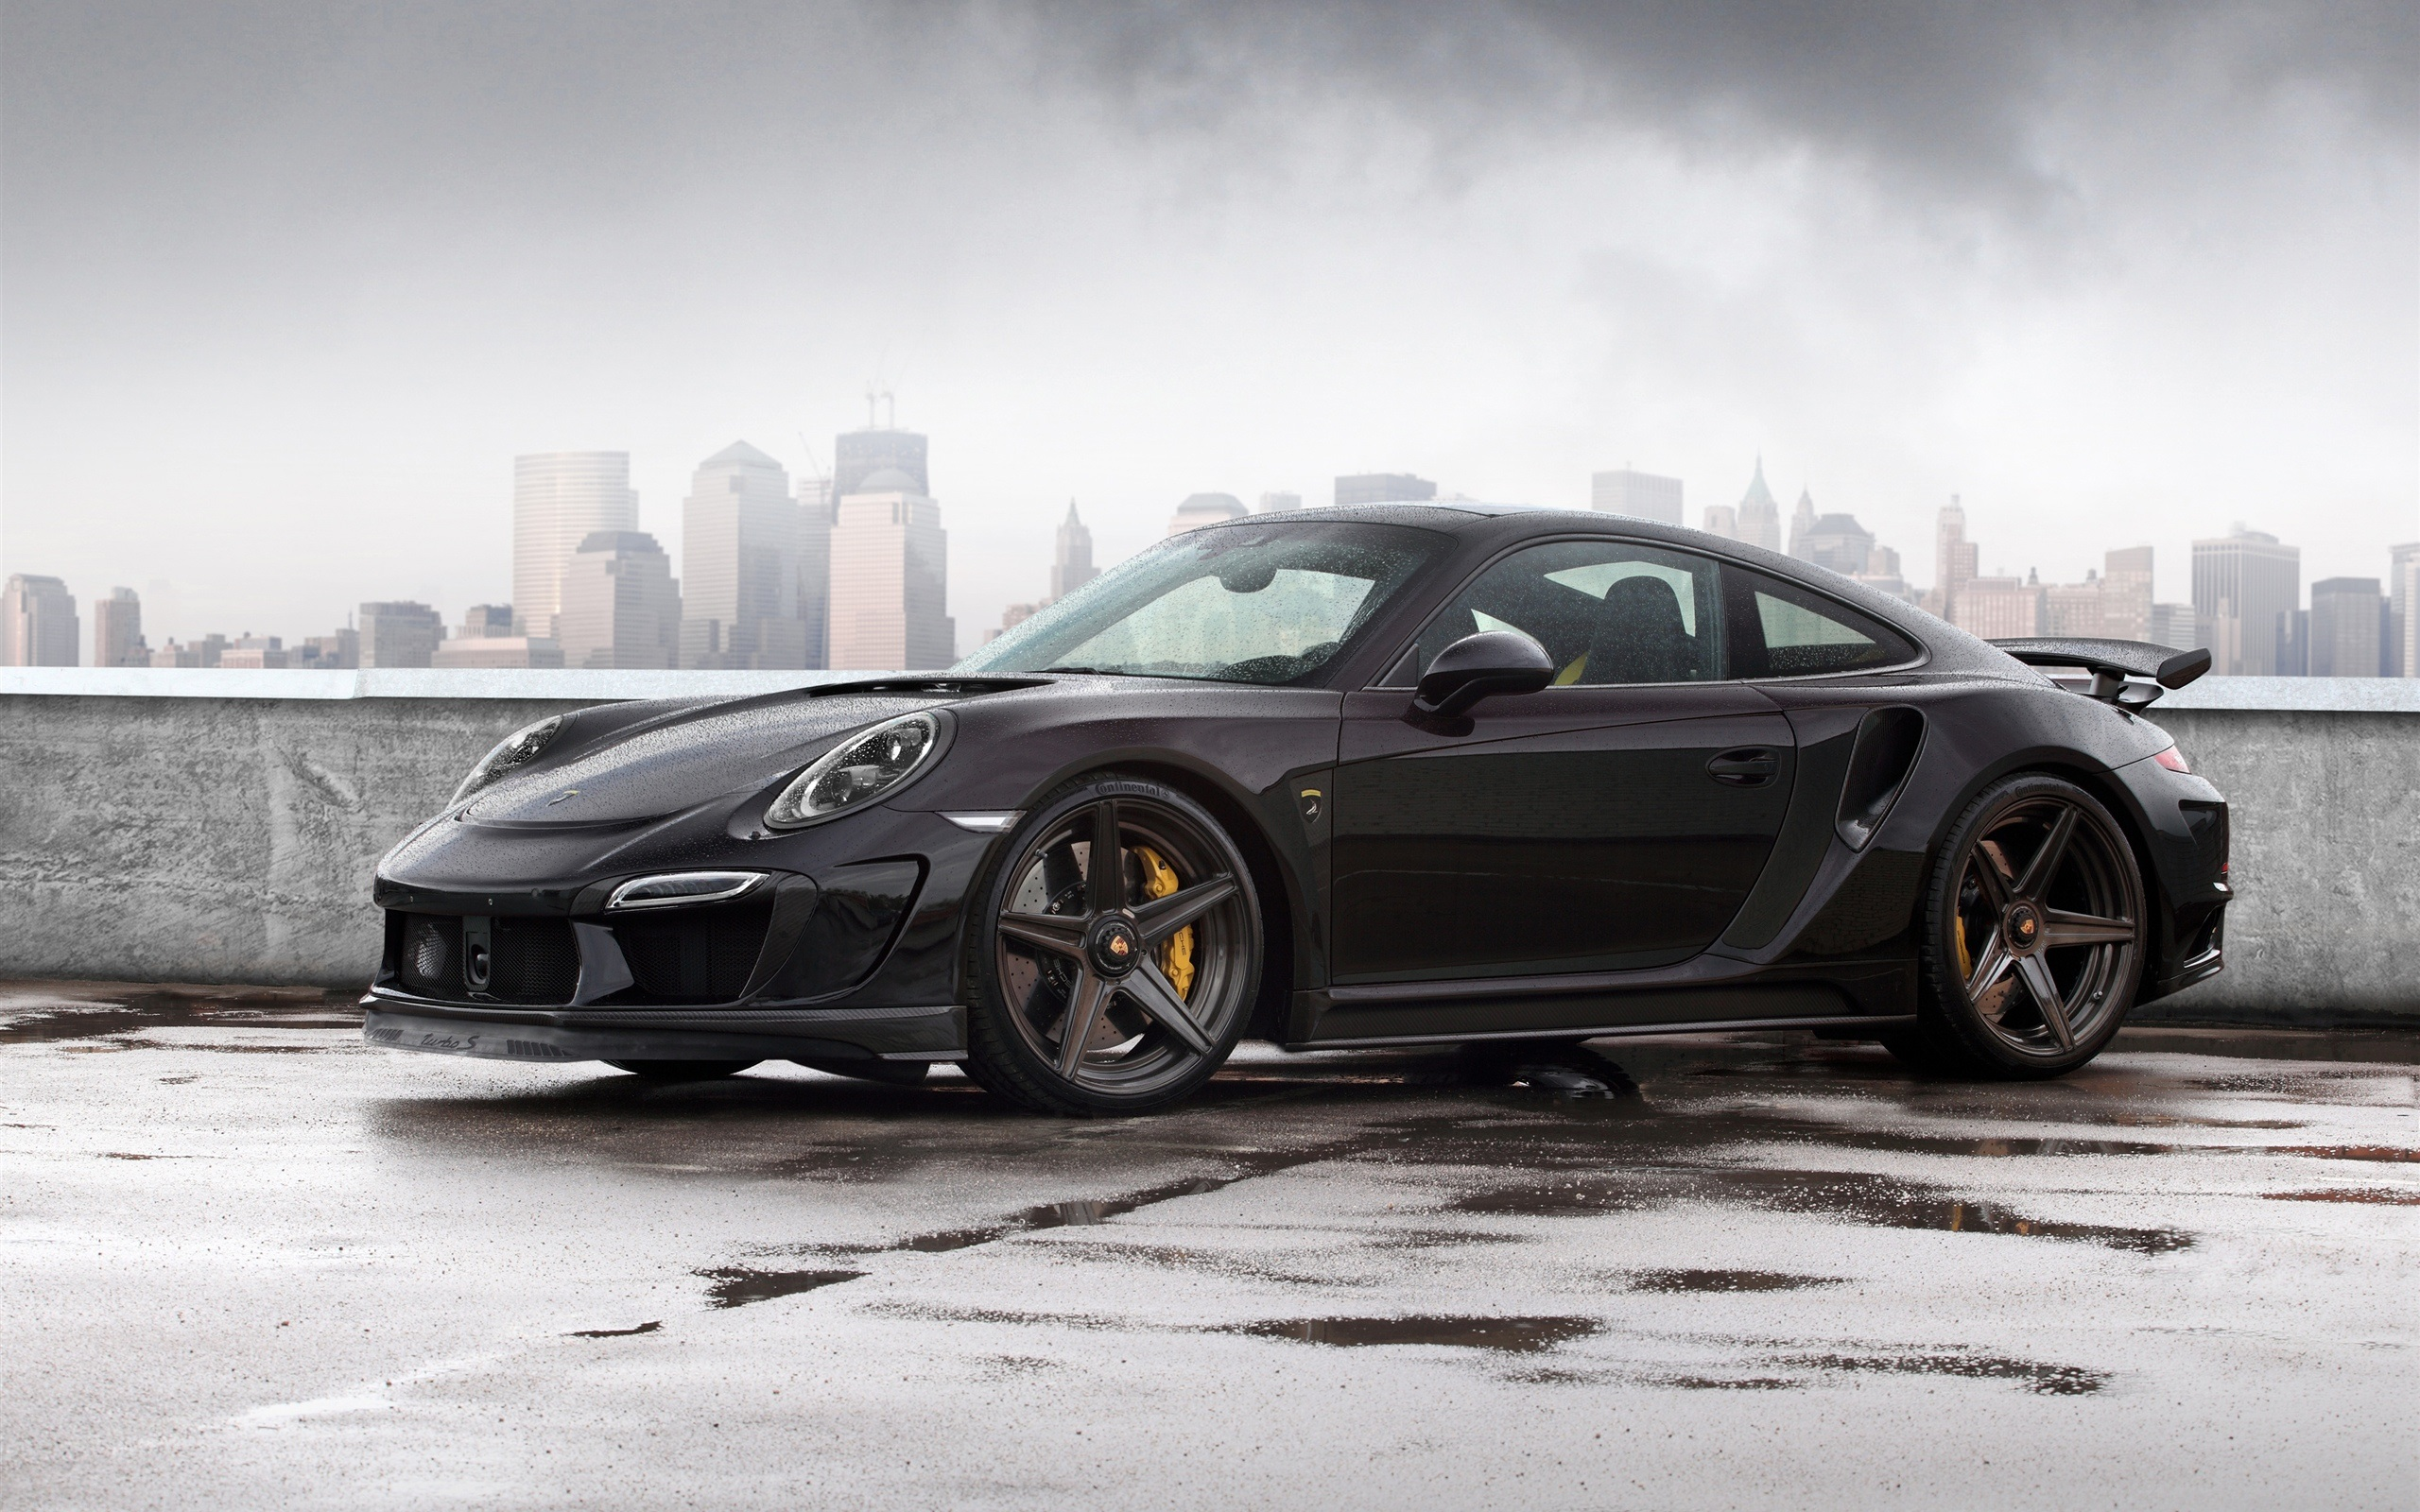 porsche 911 turbo black wallpaper - 2015 Porsche 911 Turbo Wallpaper